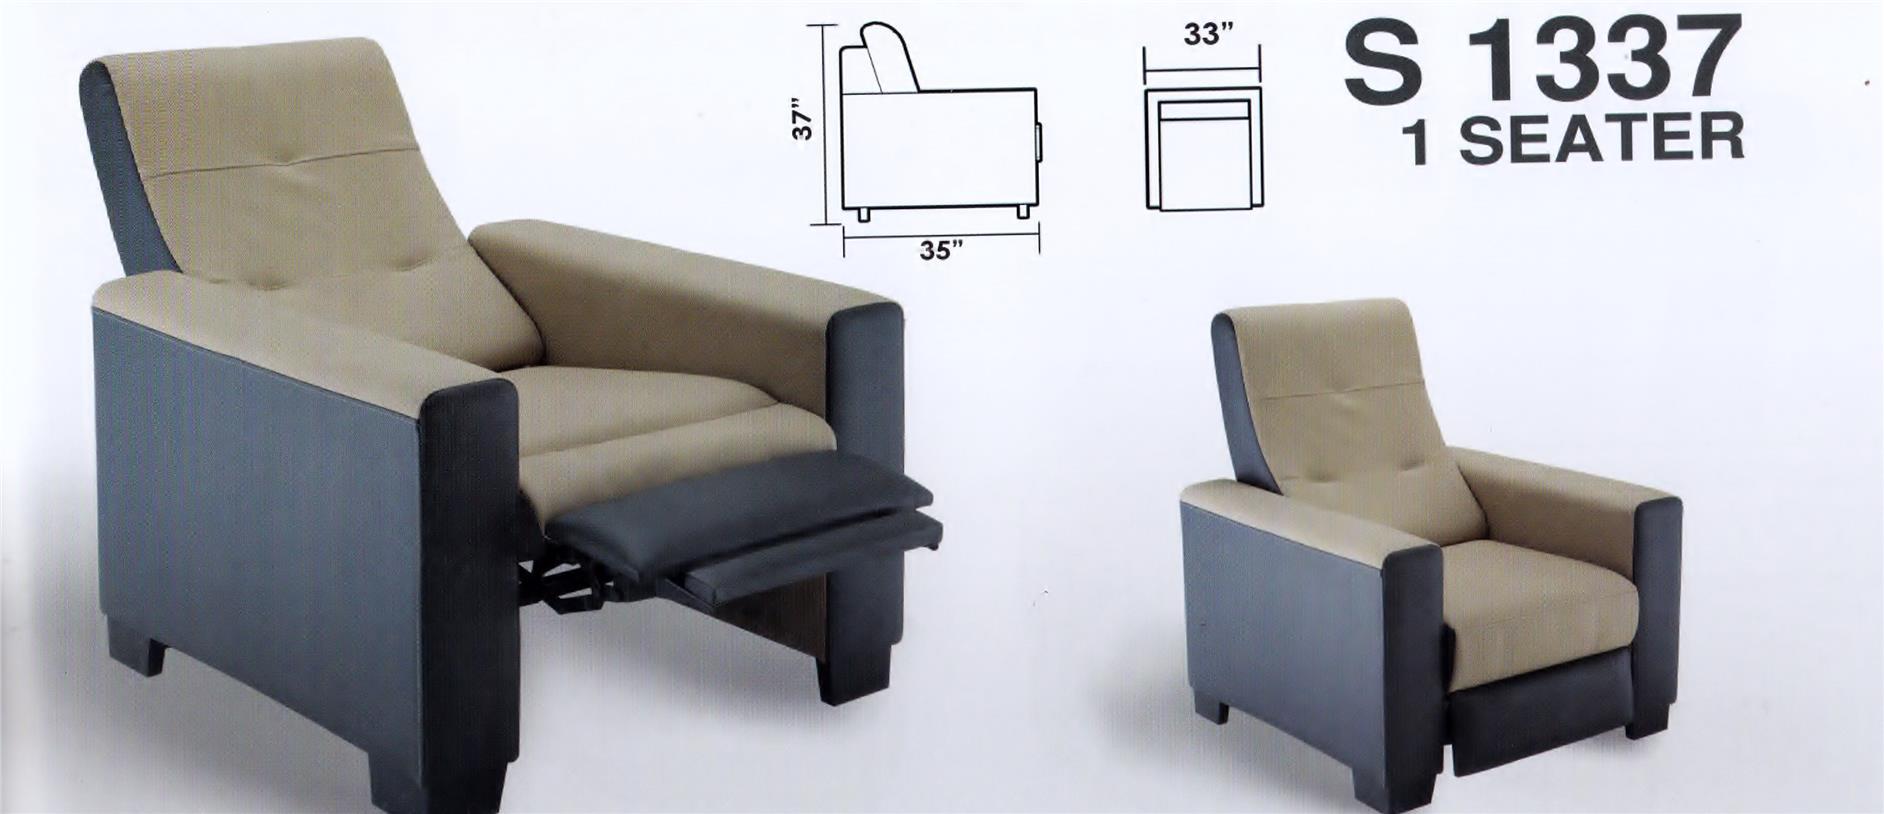 relax sofa chair mjob blog. Black Bedroom Furniture Sets. Home Design Ideas